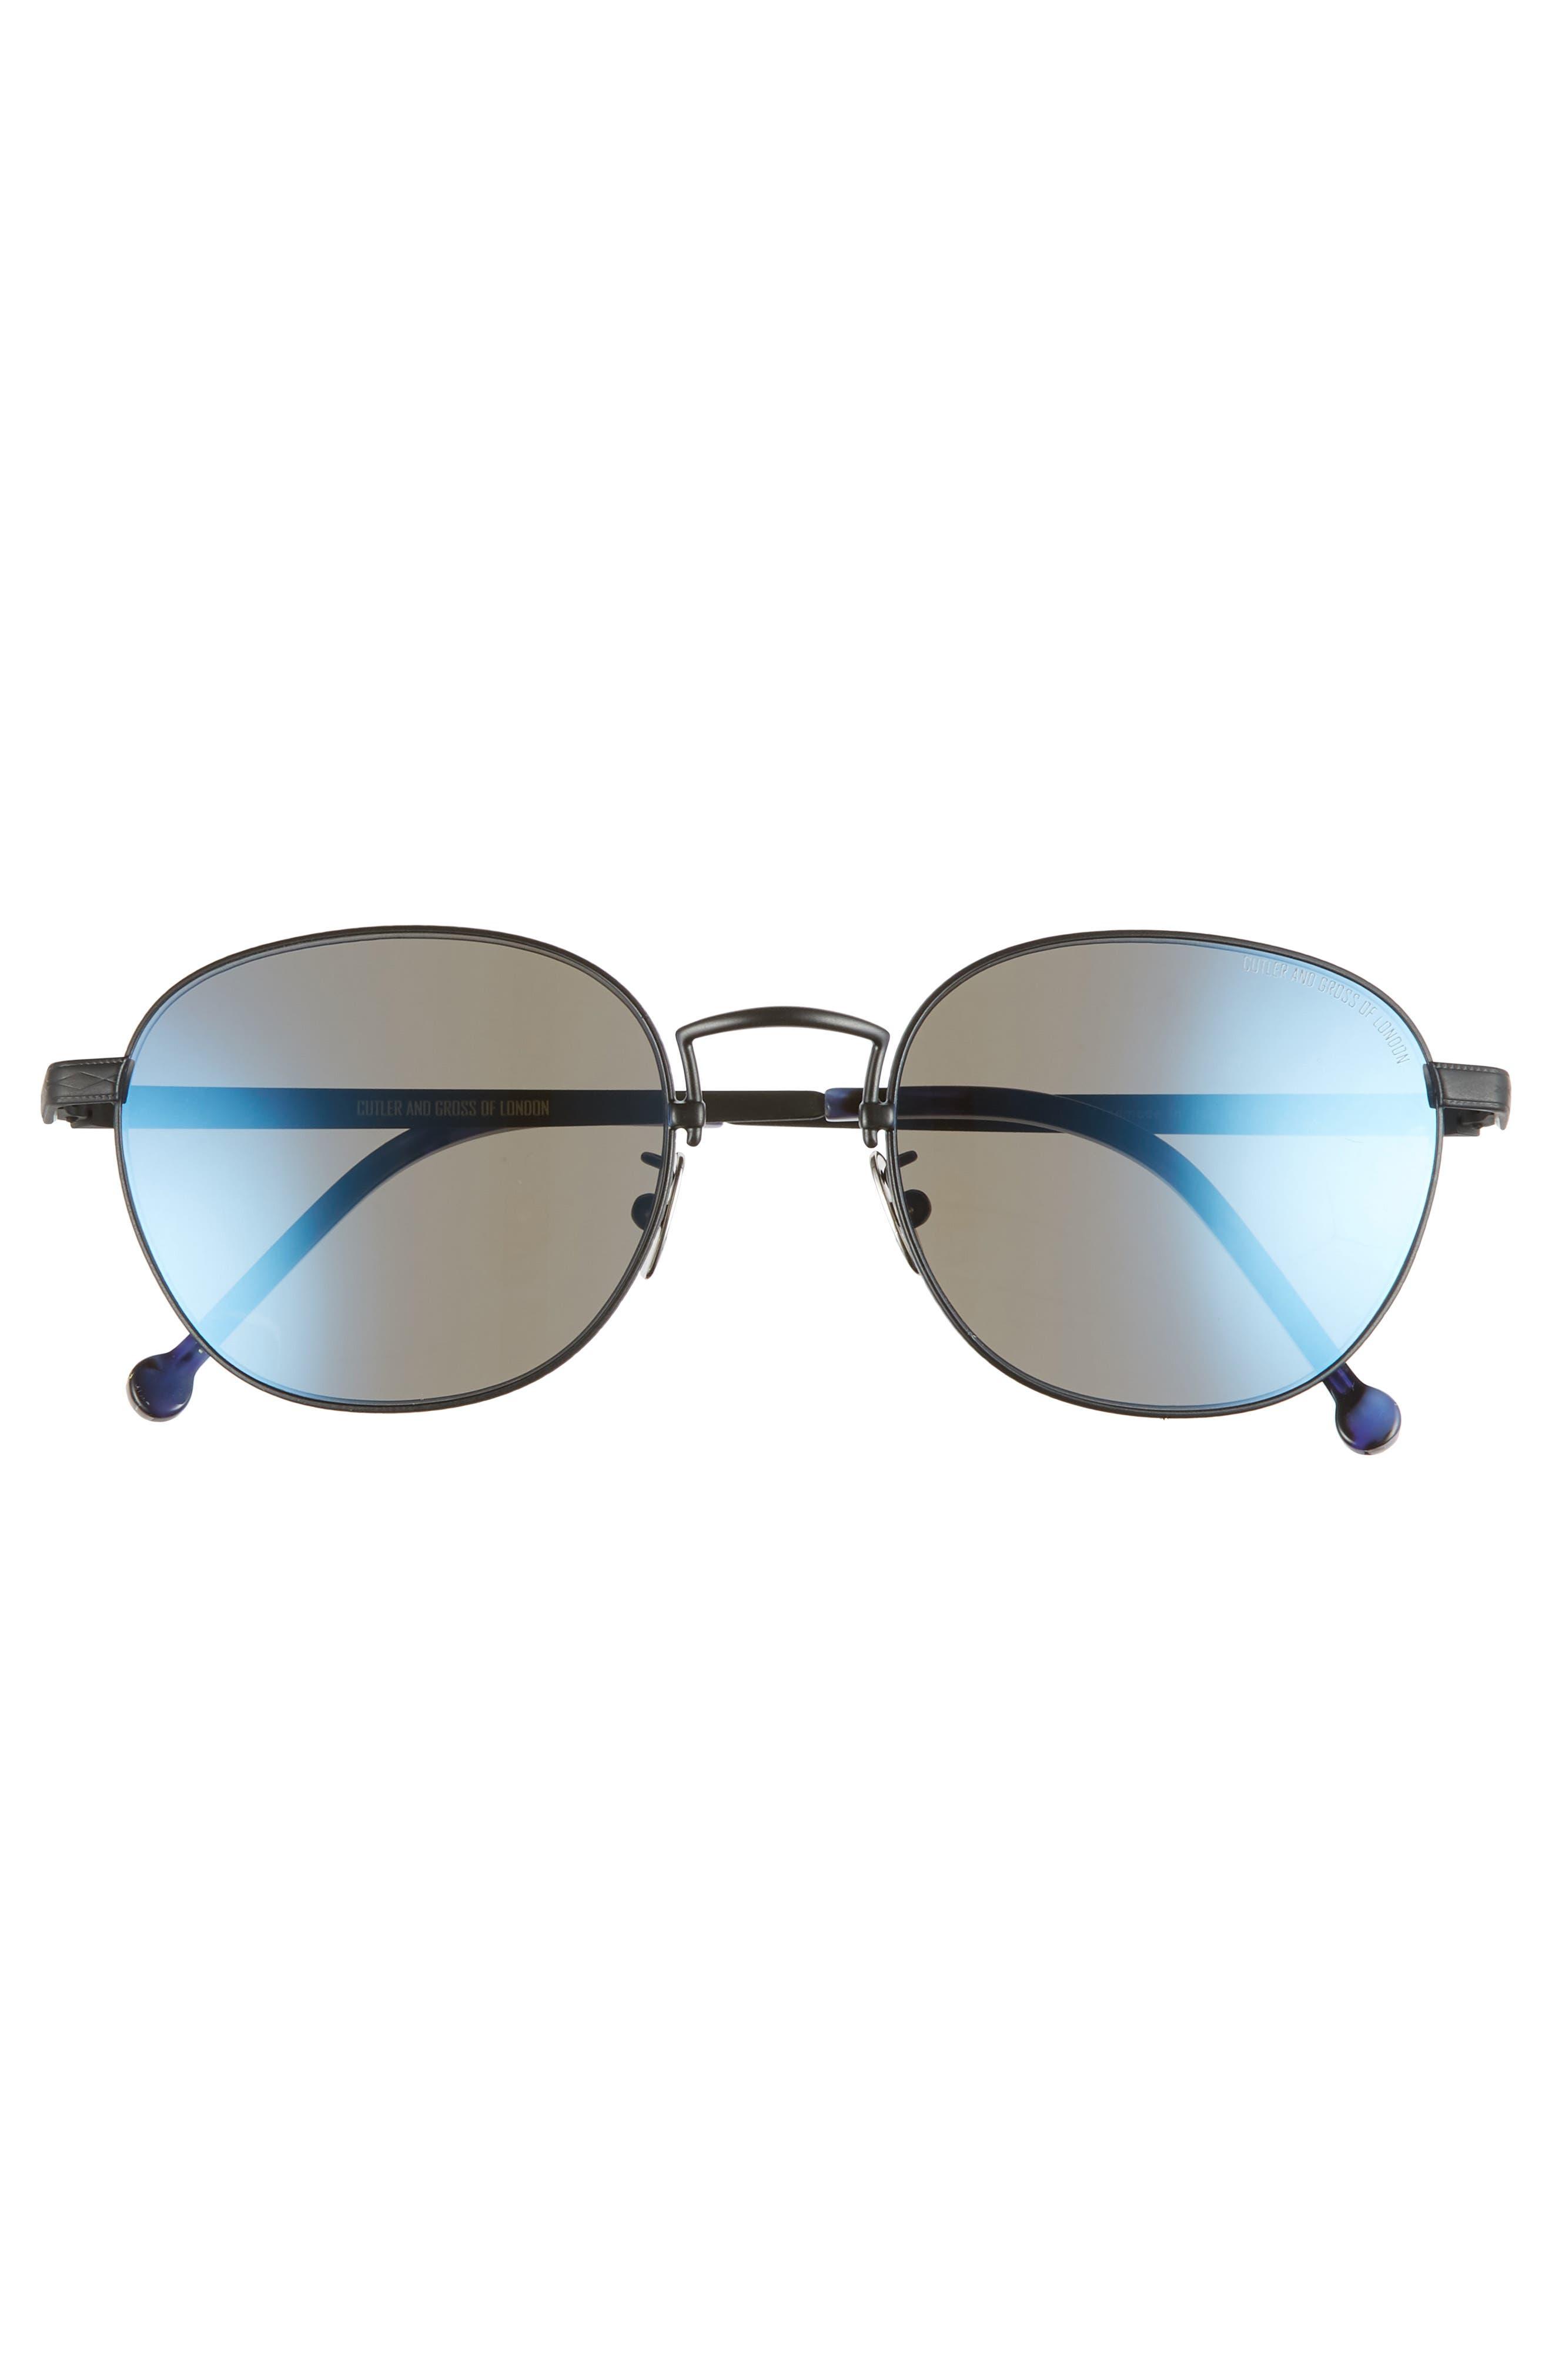 CUTLER AND GROSS, 52mm Polarized Round Sunglasses, Alternate thumbnail 2, color, SATIN PALLADIUM/ BLUE